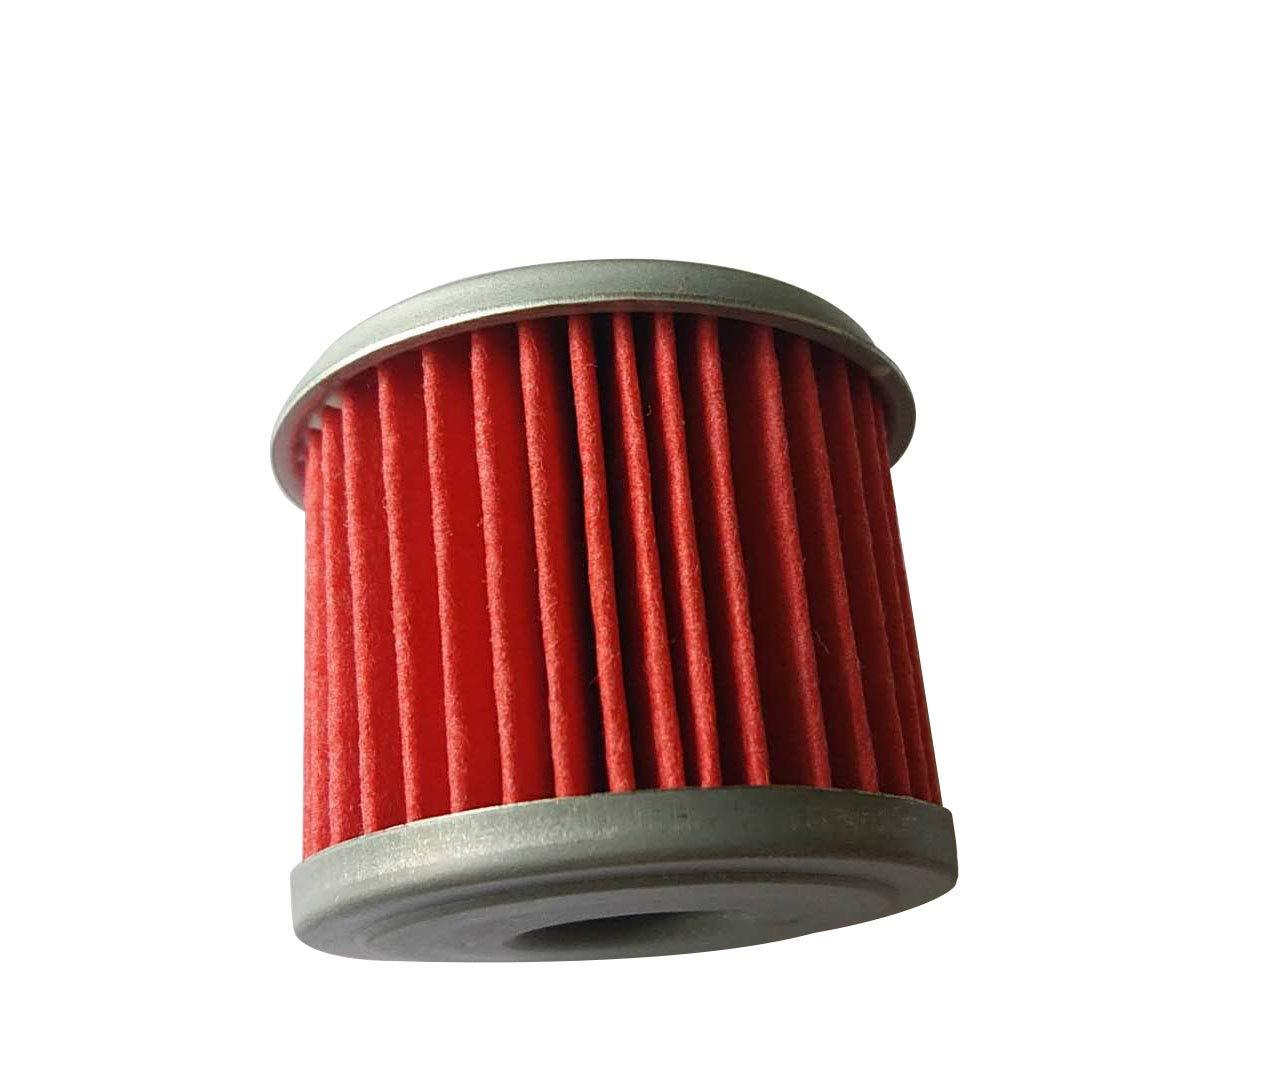 shamofeng Oil Filter For ATV Honda TRX450R CRF250X CRF450X CRF250R CRF450R Replace HF116 KN116 Pack of 10